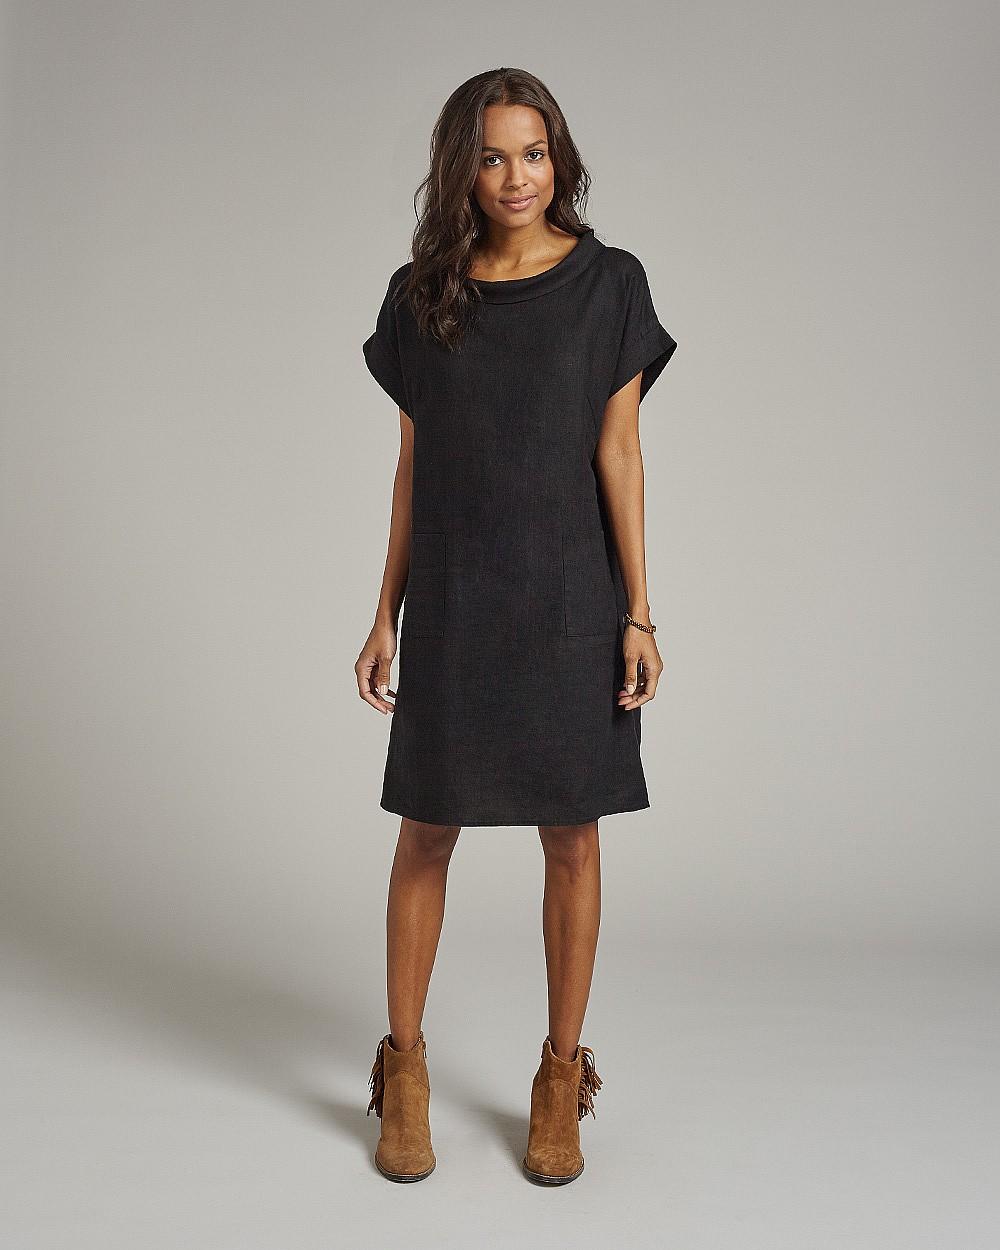 Cool summer linen dresses - Alice Butler